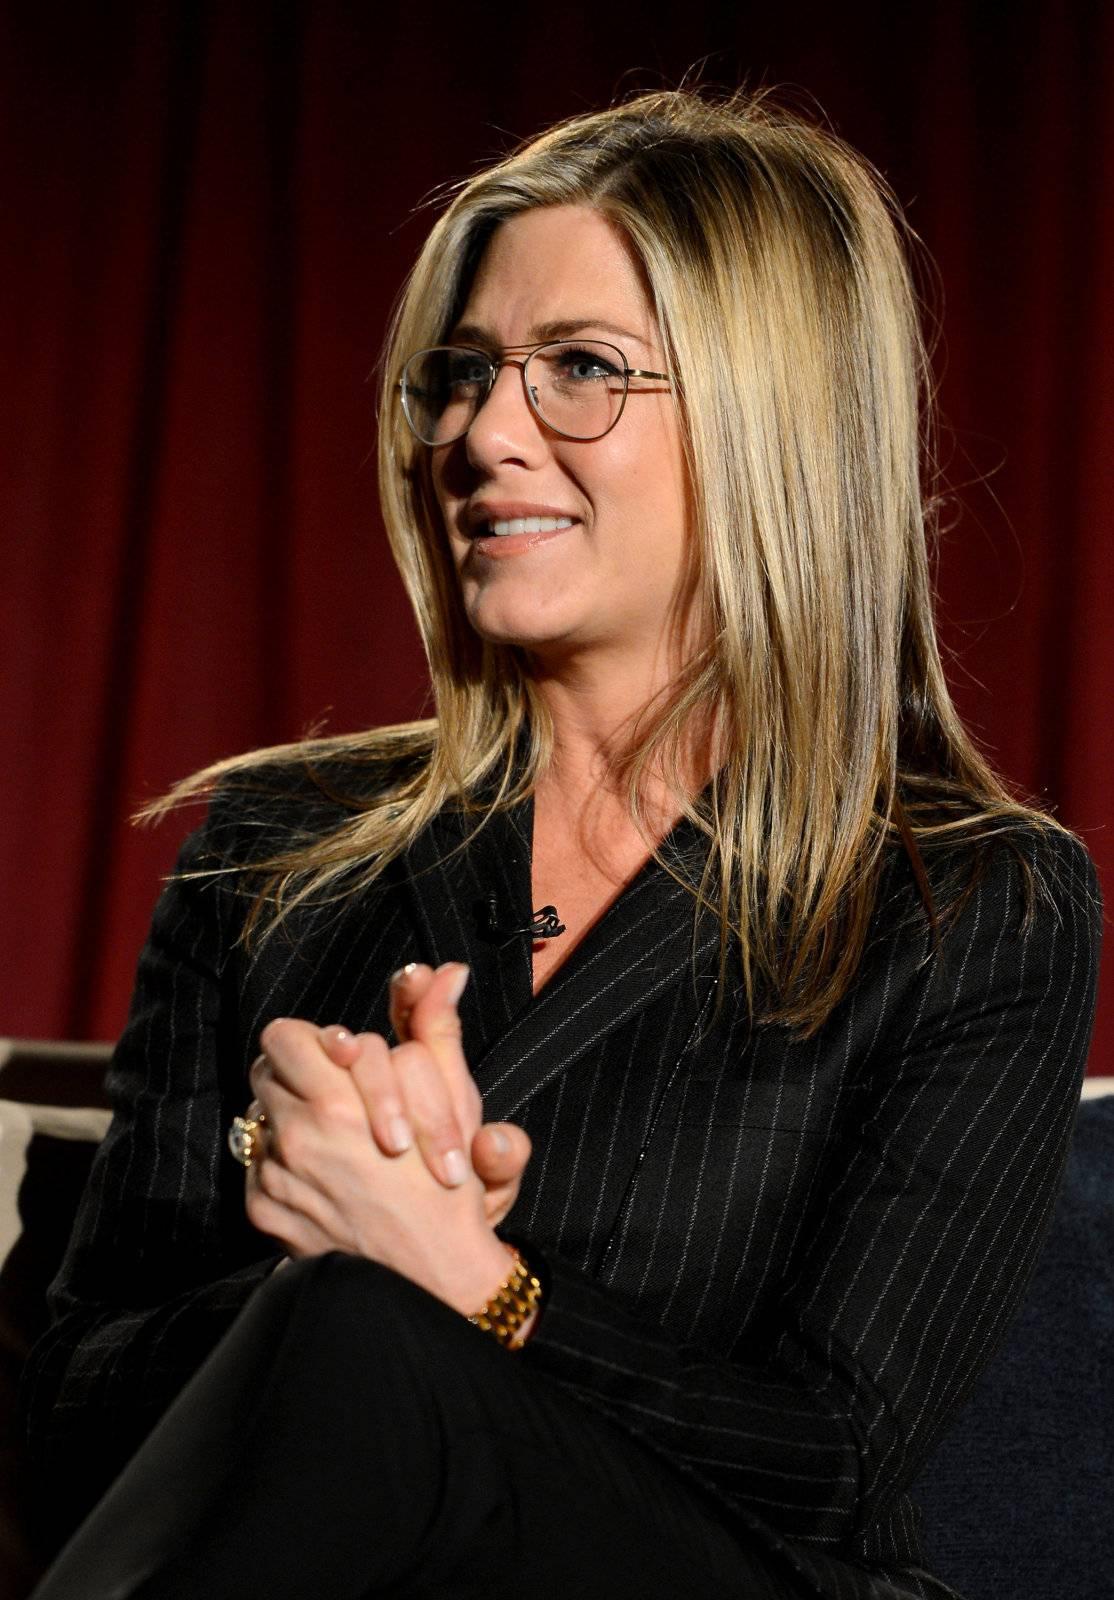 Haute 100 LA Update Jennifer Aniston Honors Director